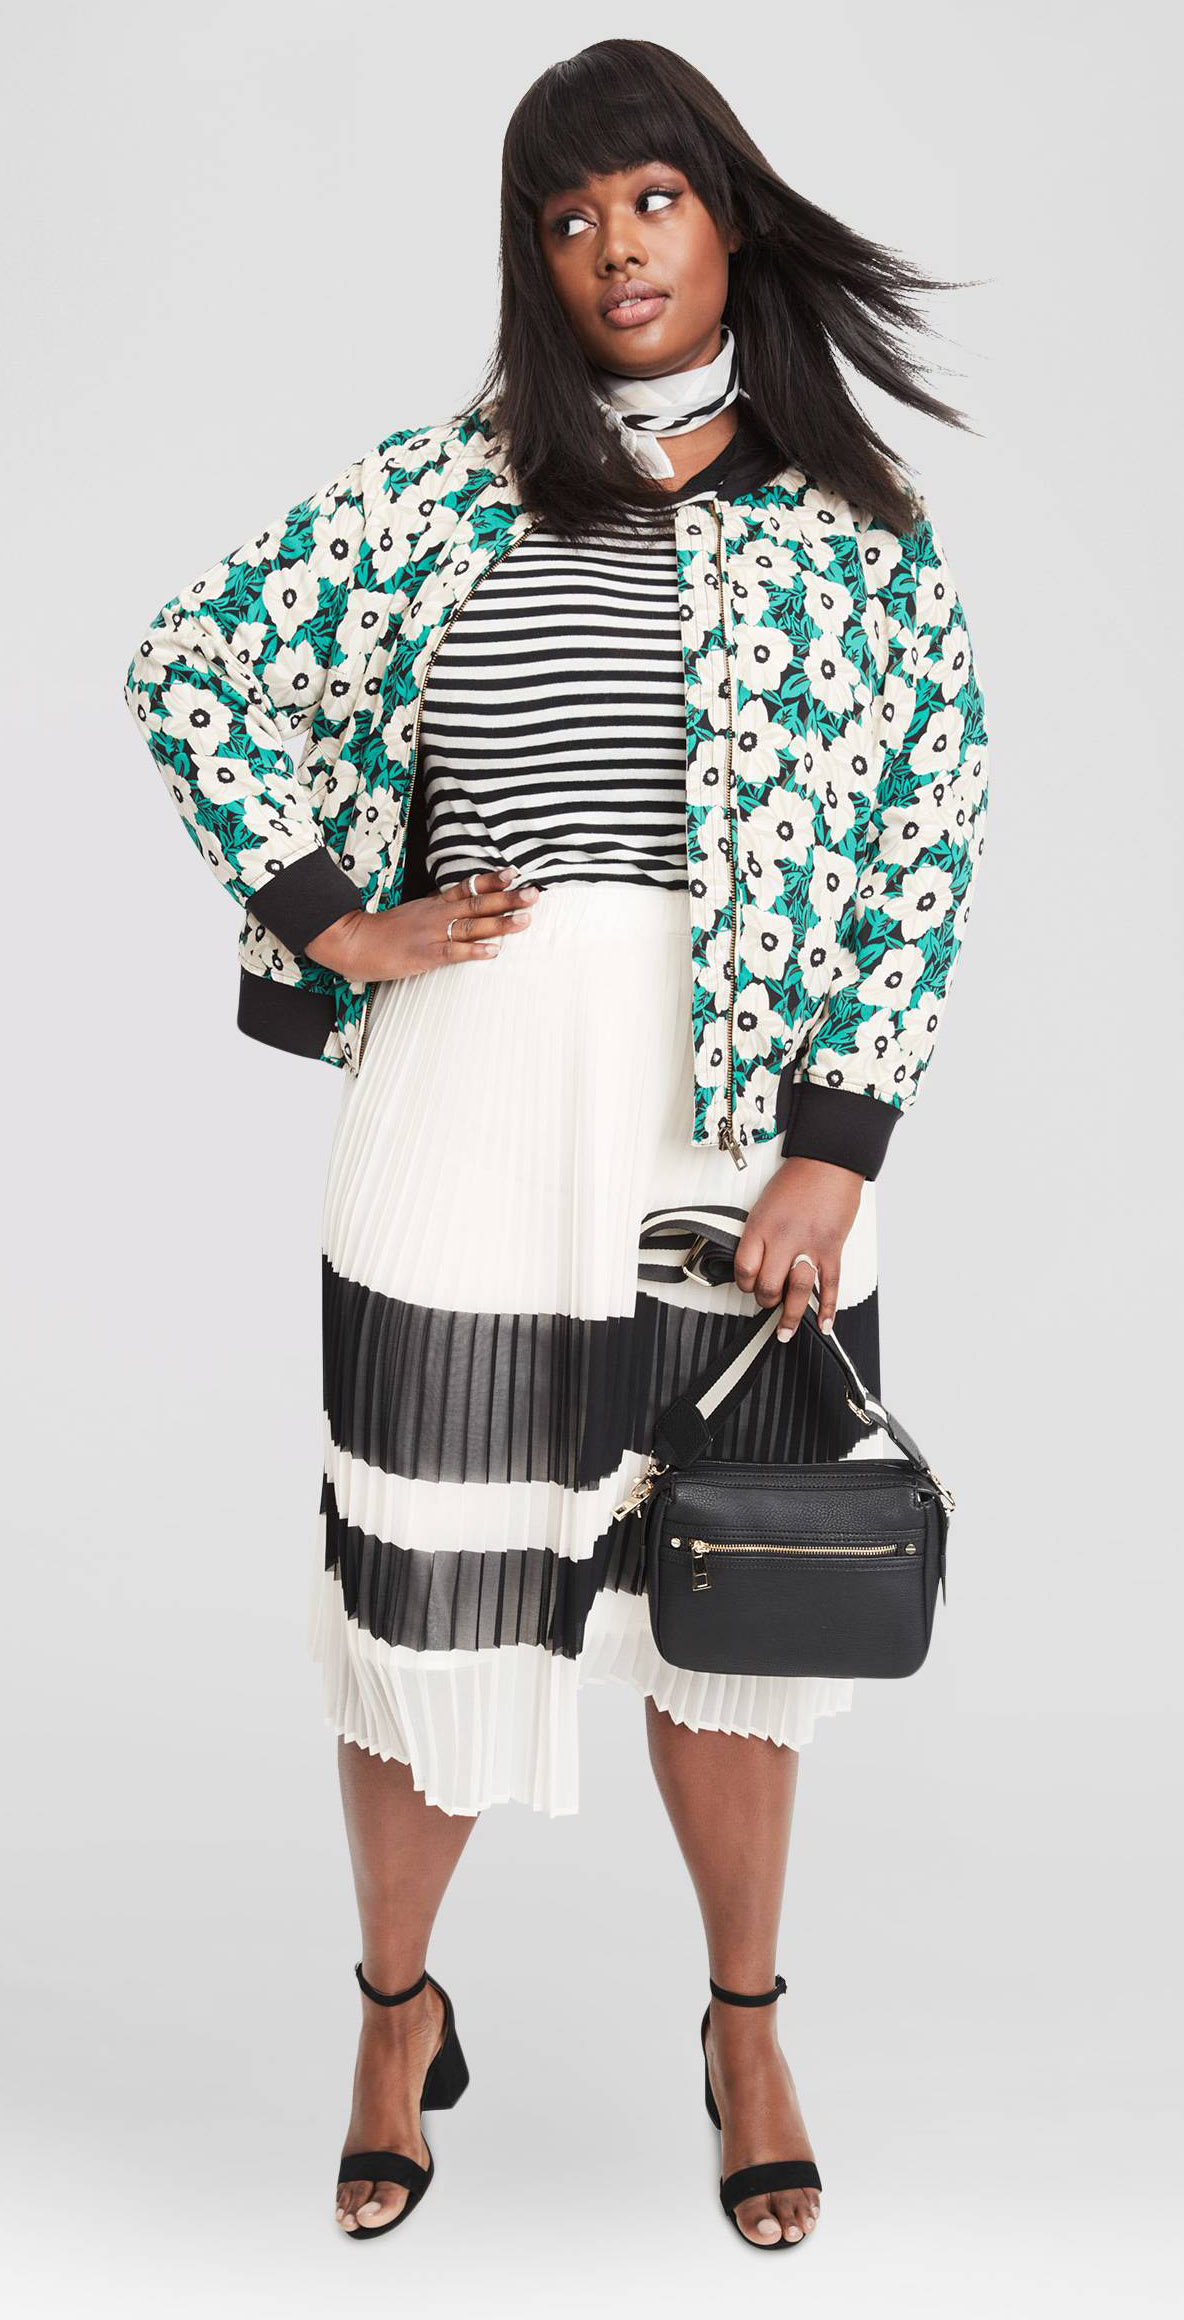 white-midi-skirt-stripe-black-tee-stripe-green-emerald-jacket-bomber-floral-print-white-scarf-neck-bandana-black-bag-black-shoe-sandalh-mix-outfit-spring-summer-brun-dinner.jpg